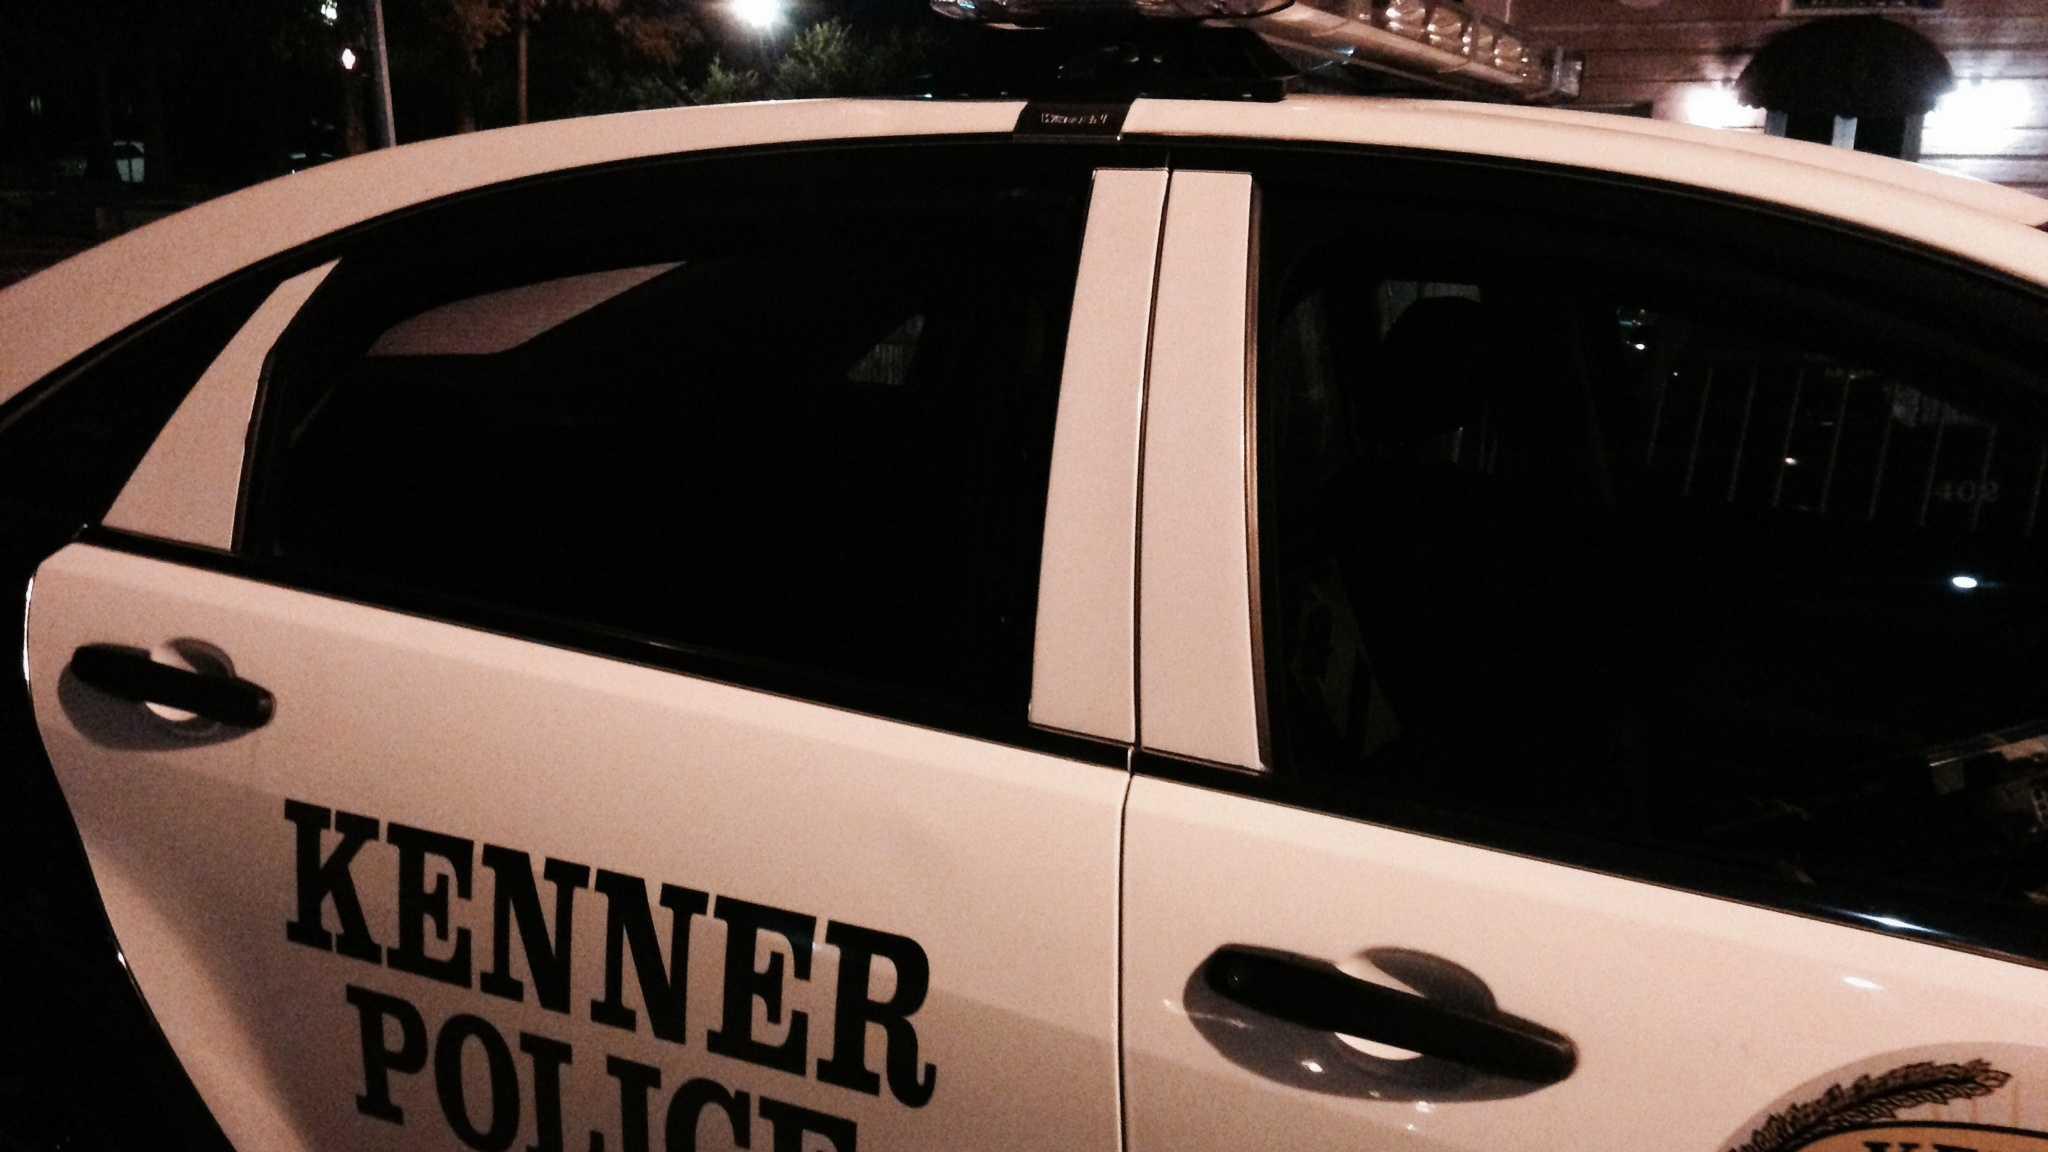 Kenner Police generic (night).JPG